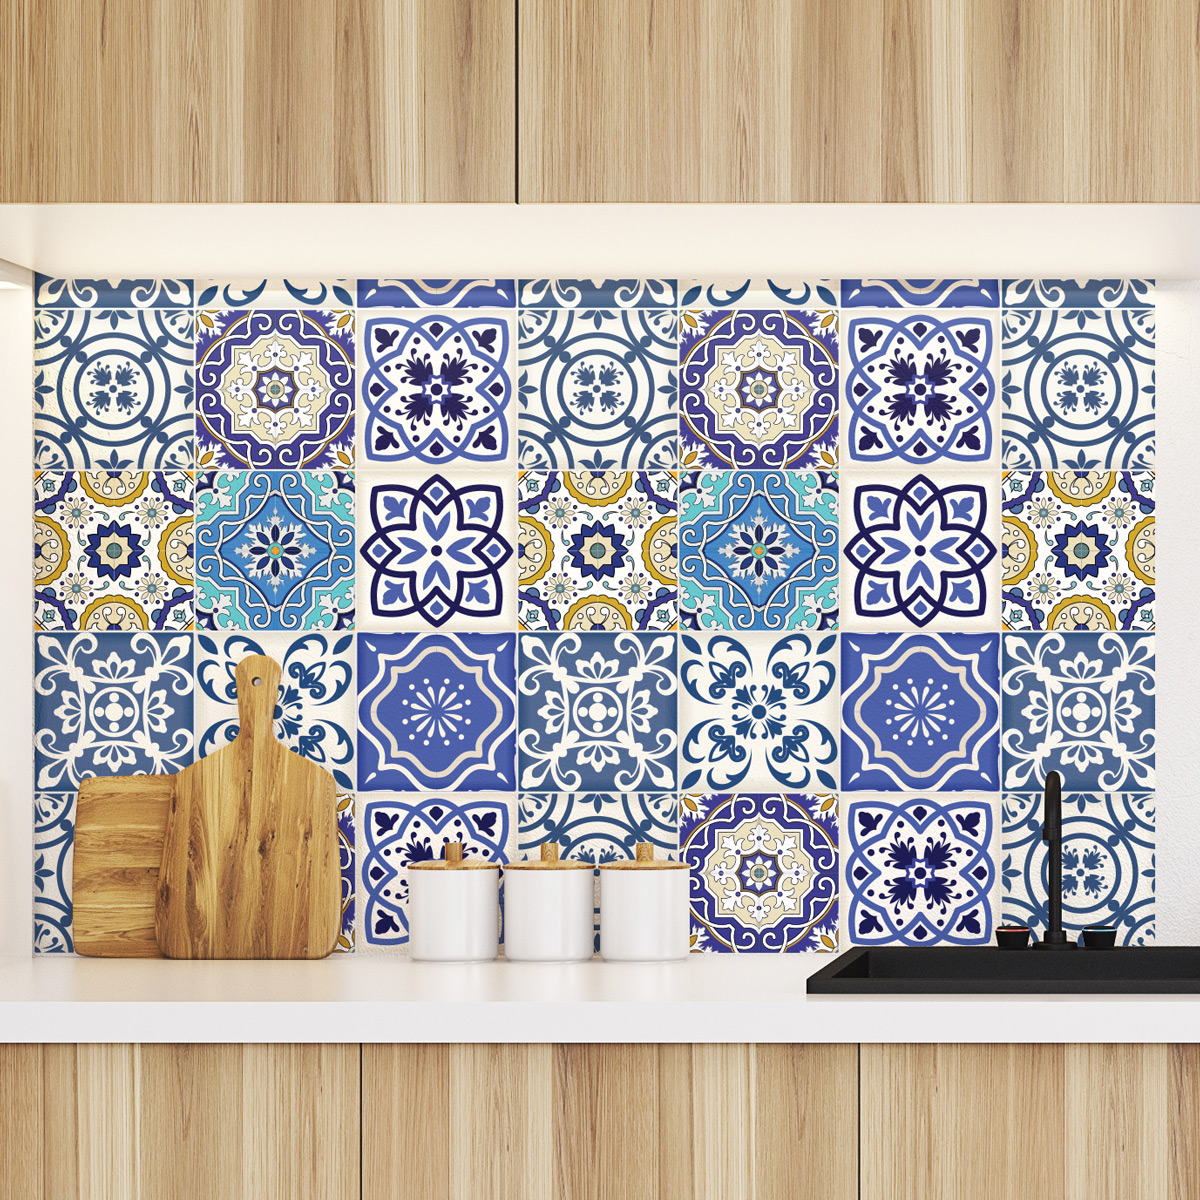 9 stickers carrelages azulejos calypso cuisine. Black Bedroom Furniture Sets. Home Design Ideas